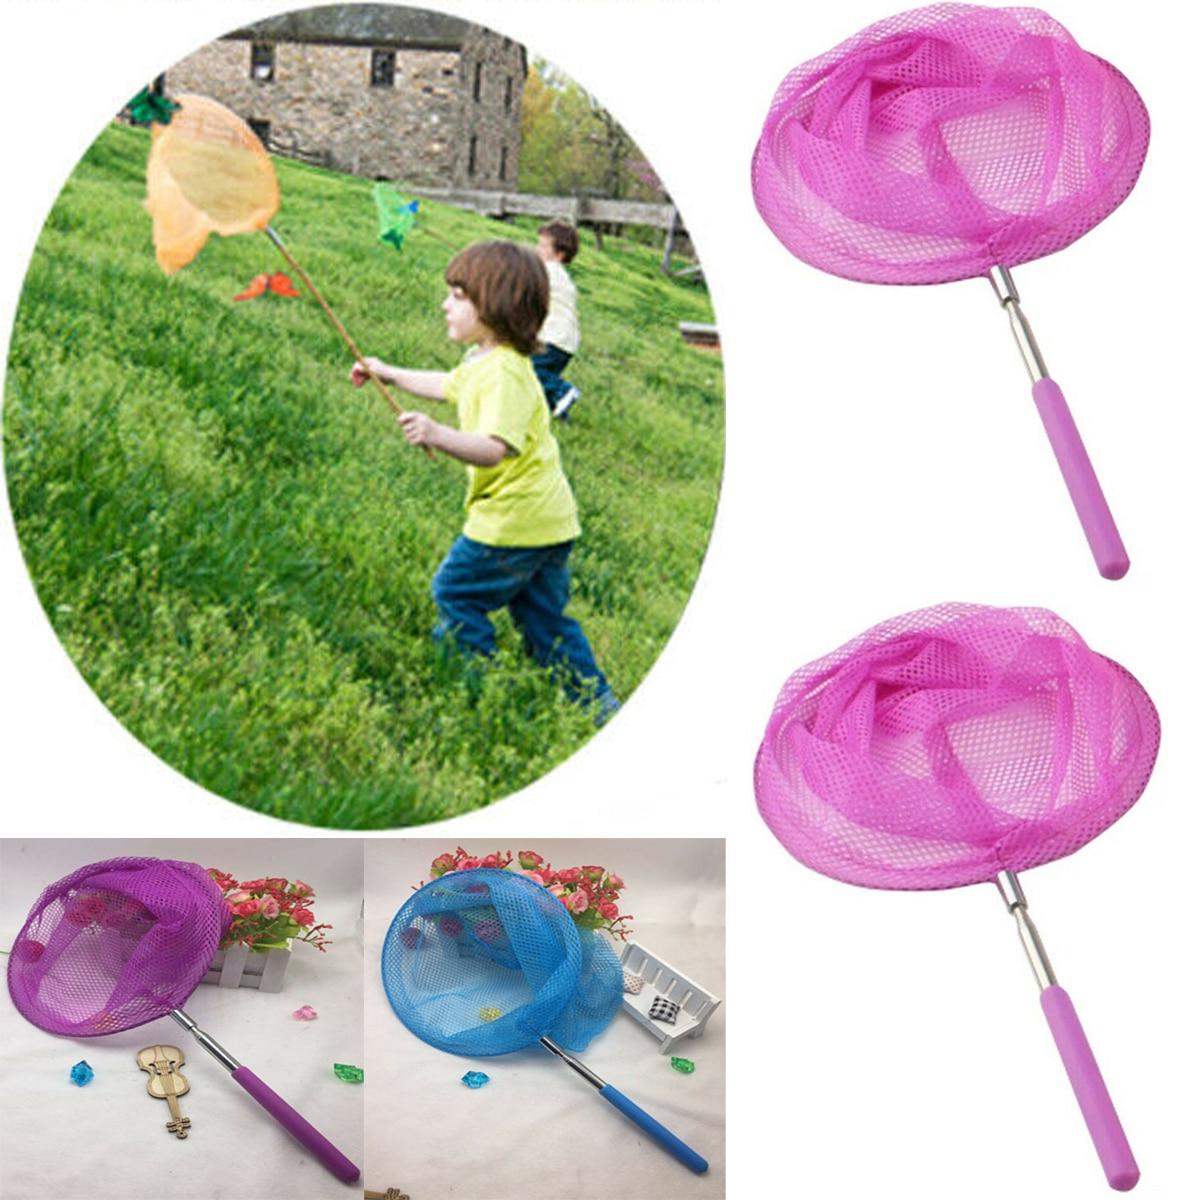 #Childrens Kids Extendable Net Telescopic Sea Fishing Bug Butterfly Catcher Mesh